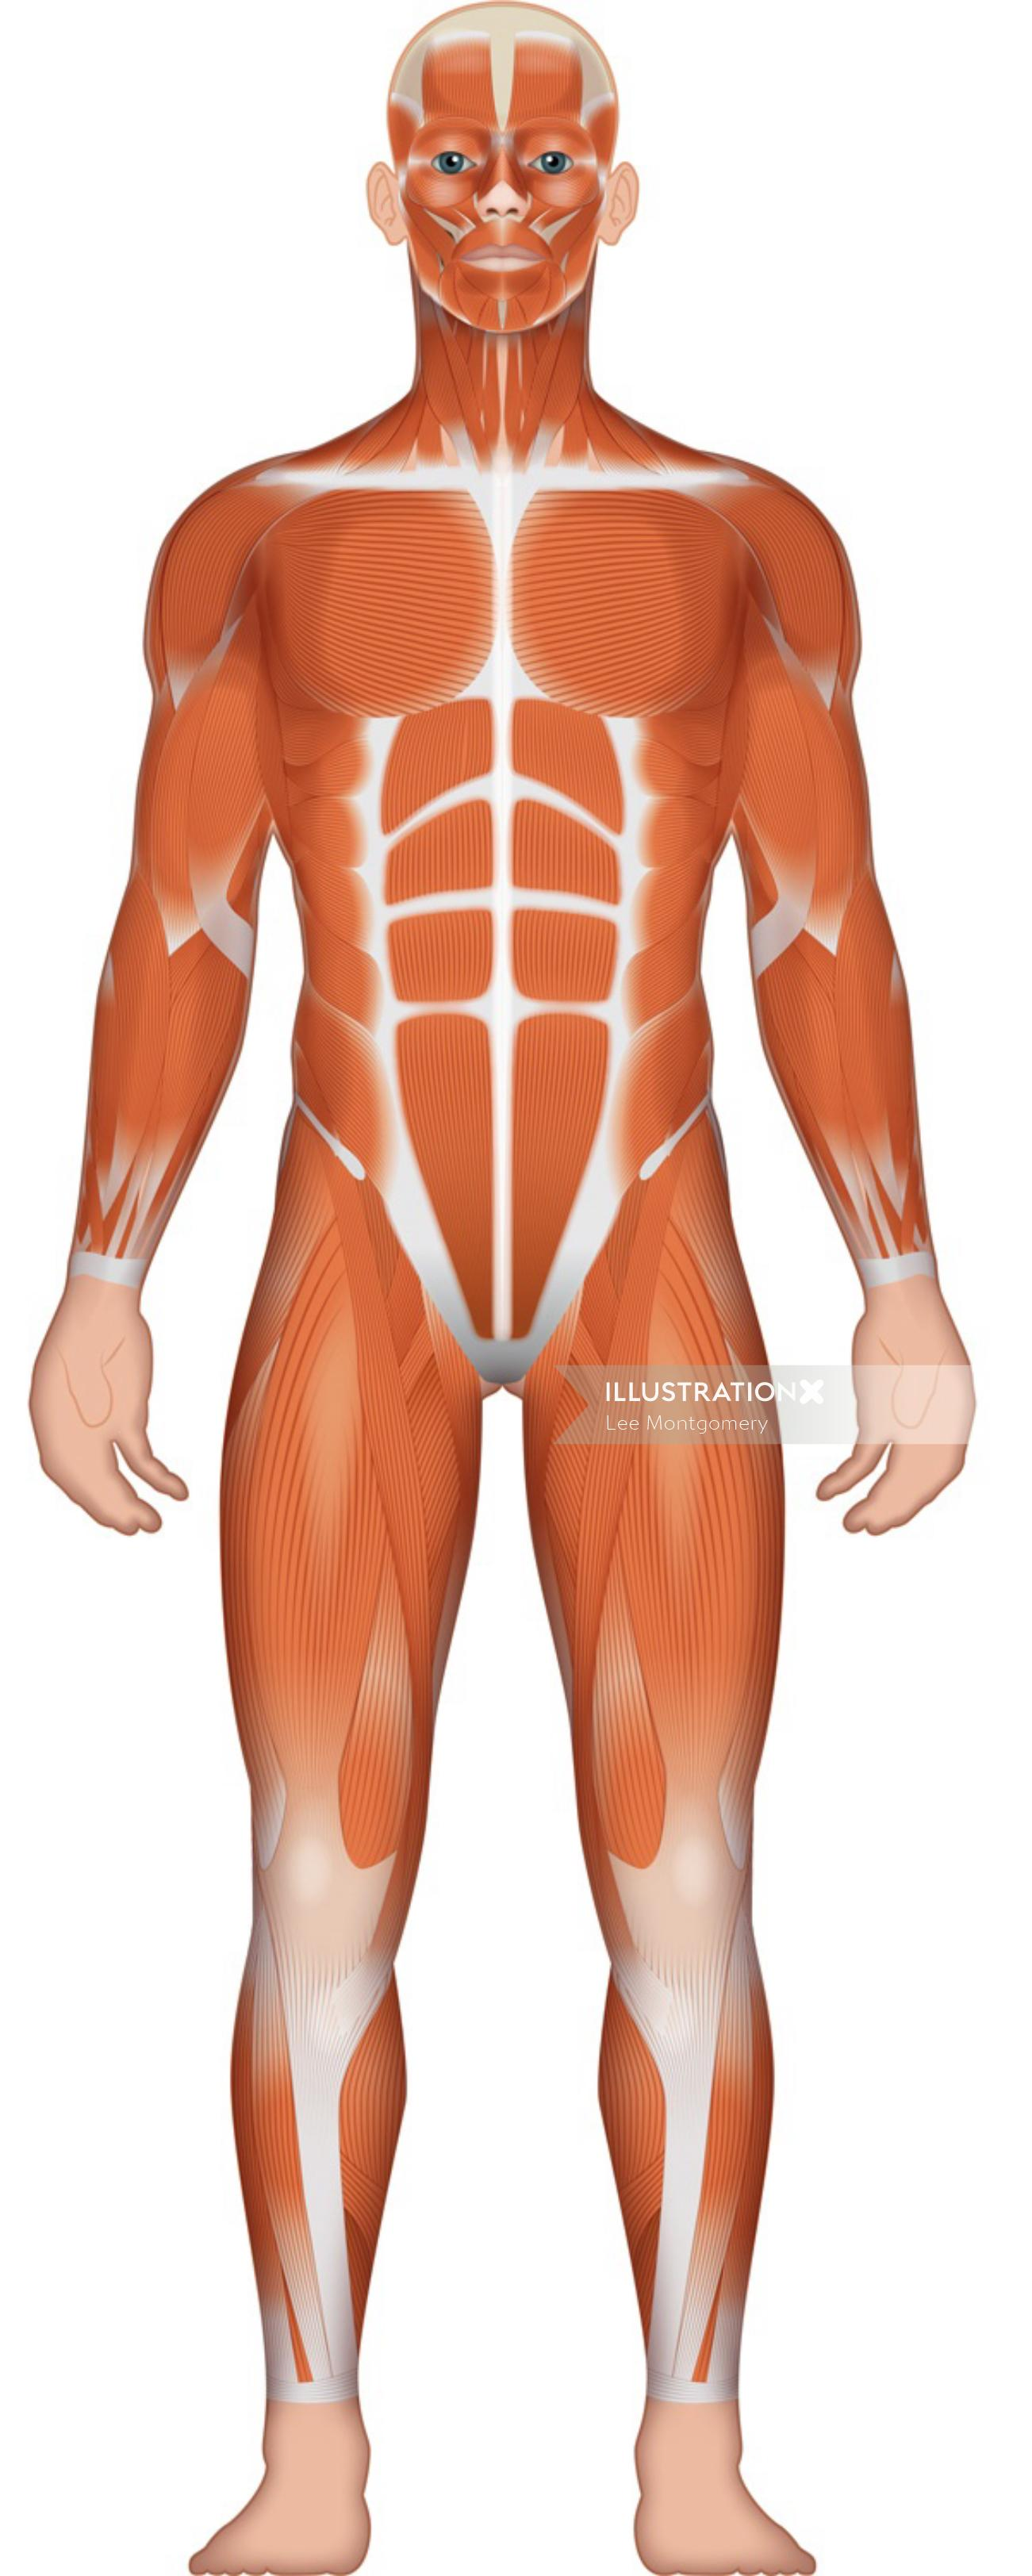 Illustration of Musculature